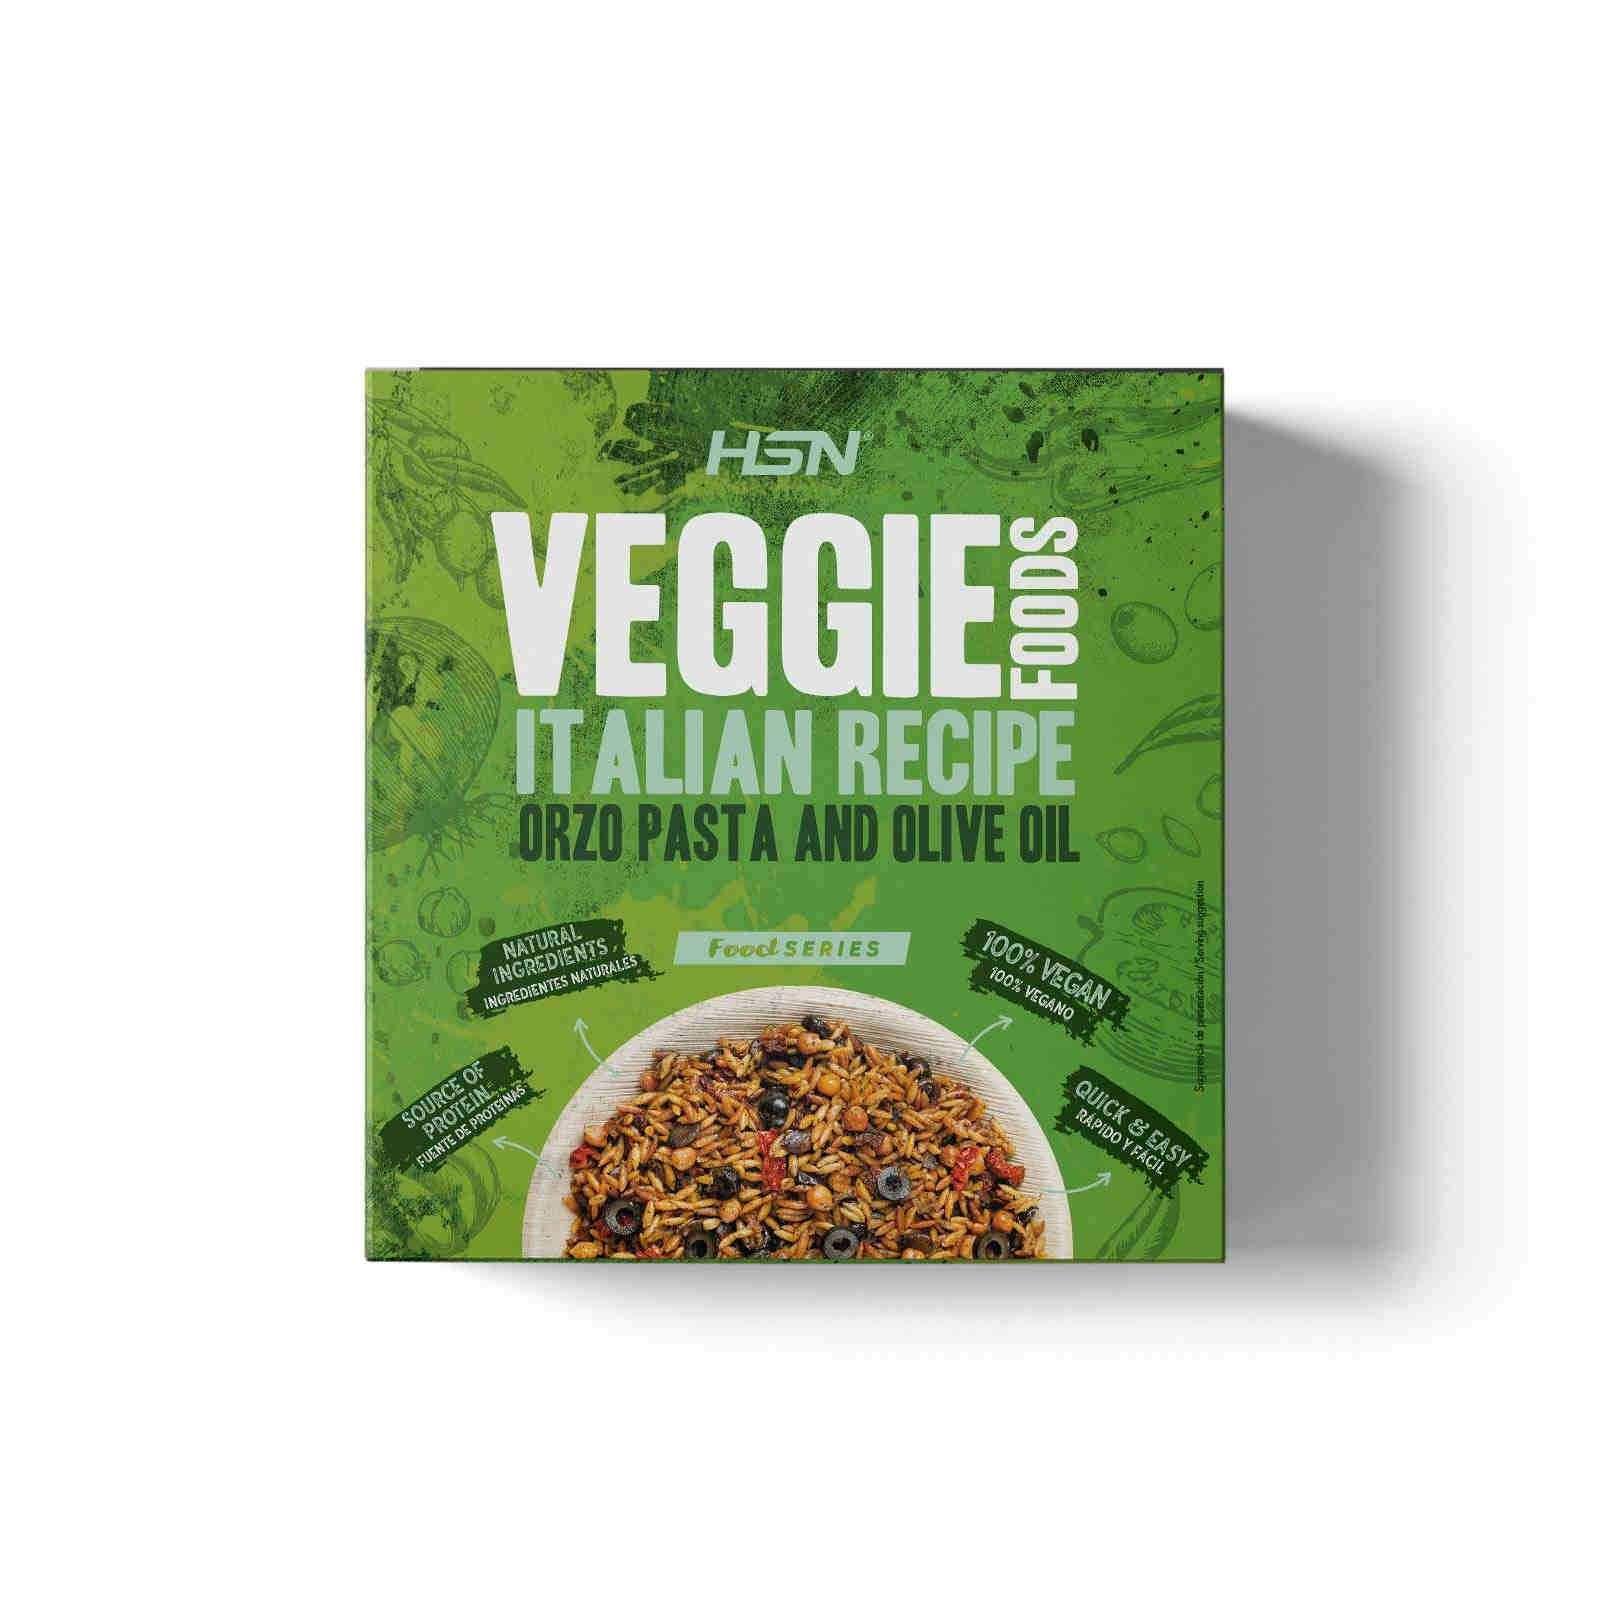 VEGGIE FOODS PASTA ORZO CON ACEITE DE OLIVA ESTILO ITALIANO - 280g